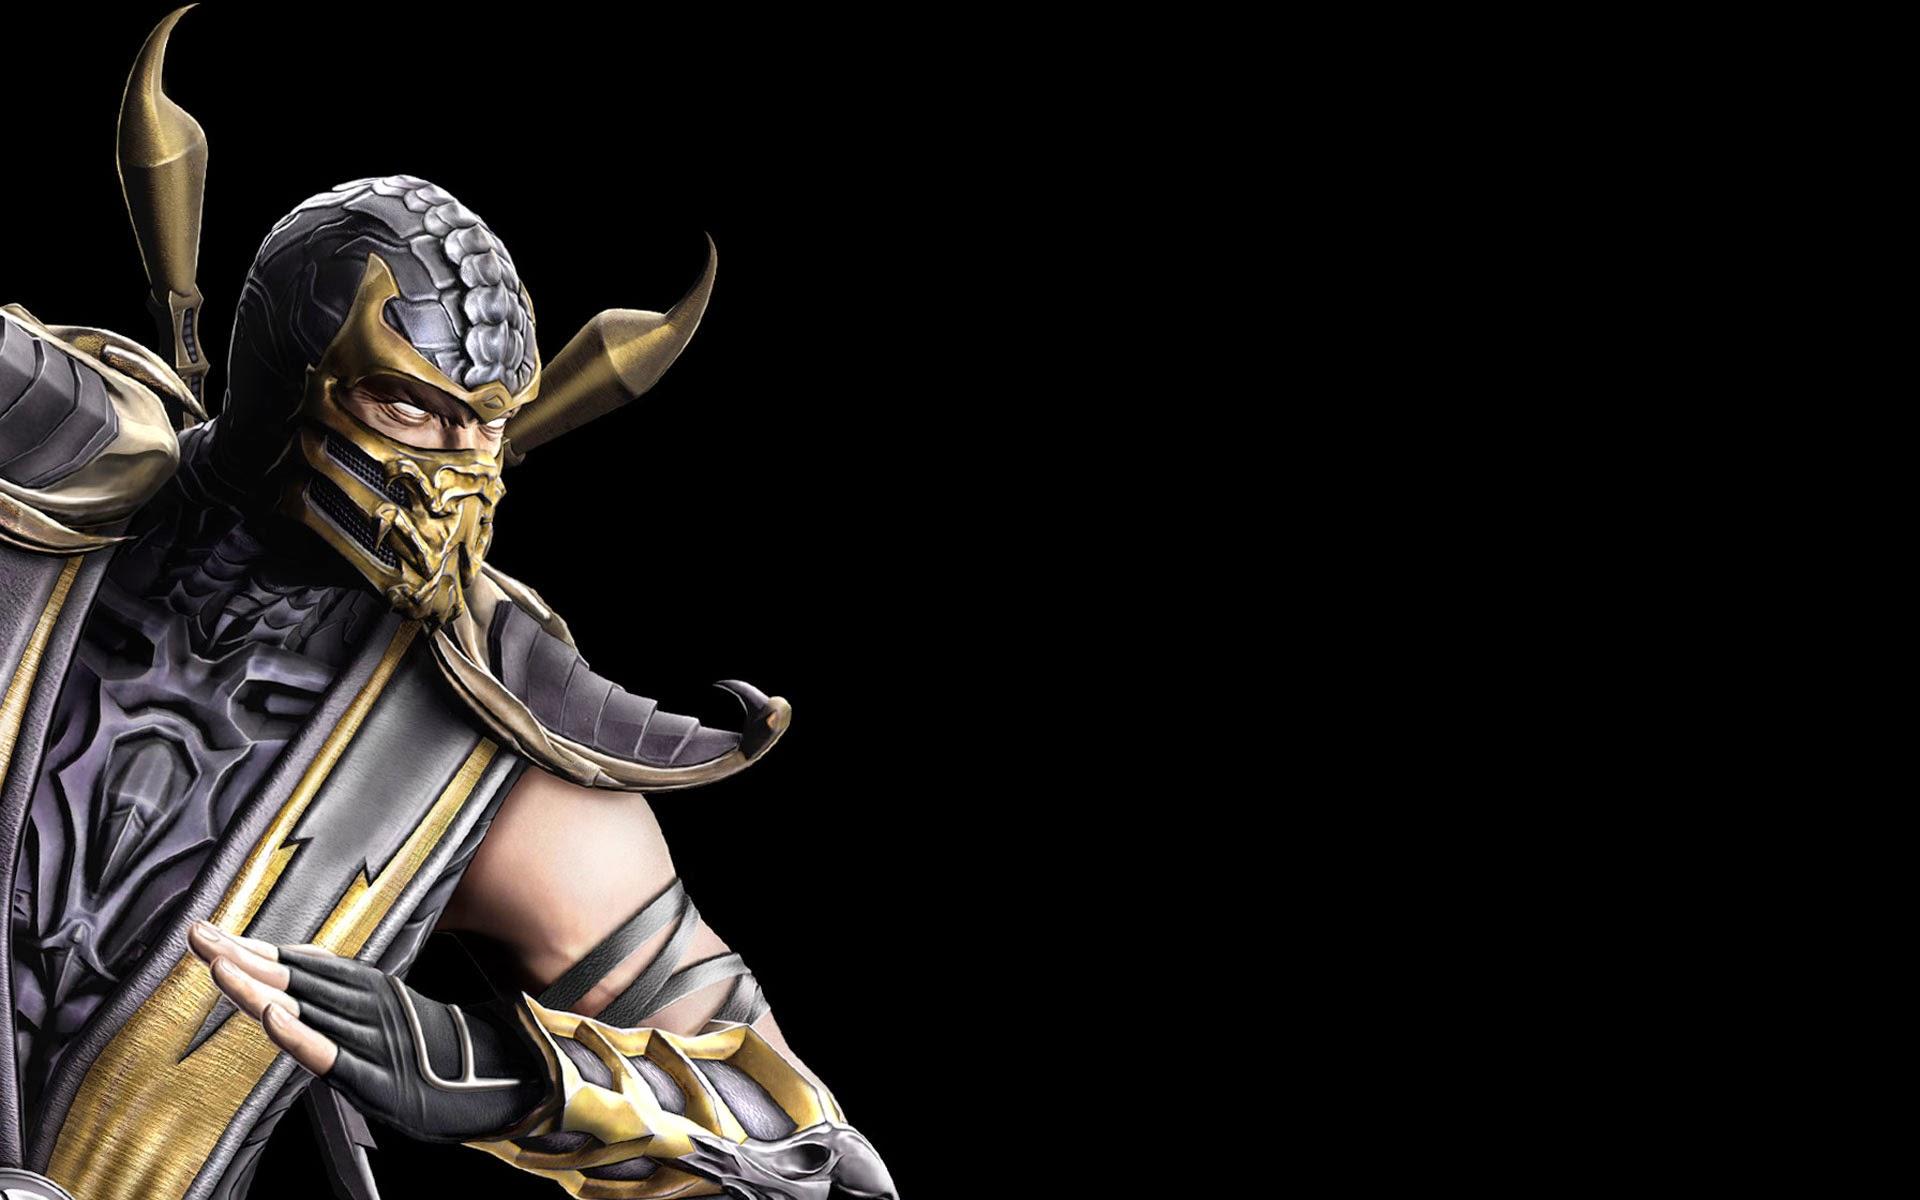 Scorpion Wallpaper Mortal Kombat 3D Images